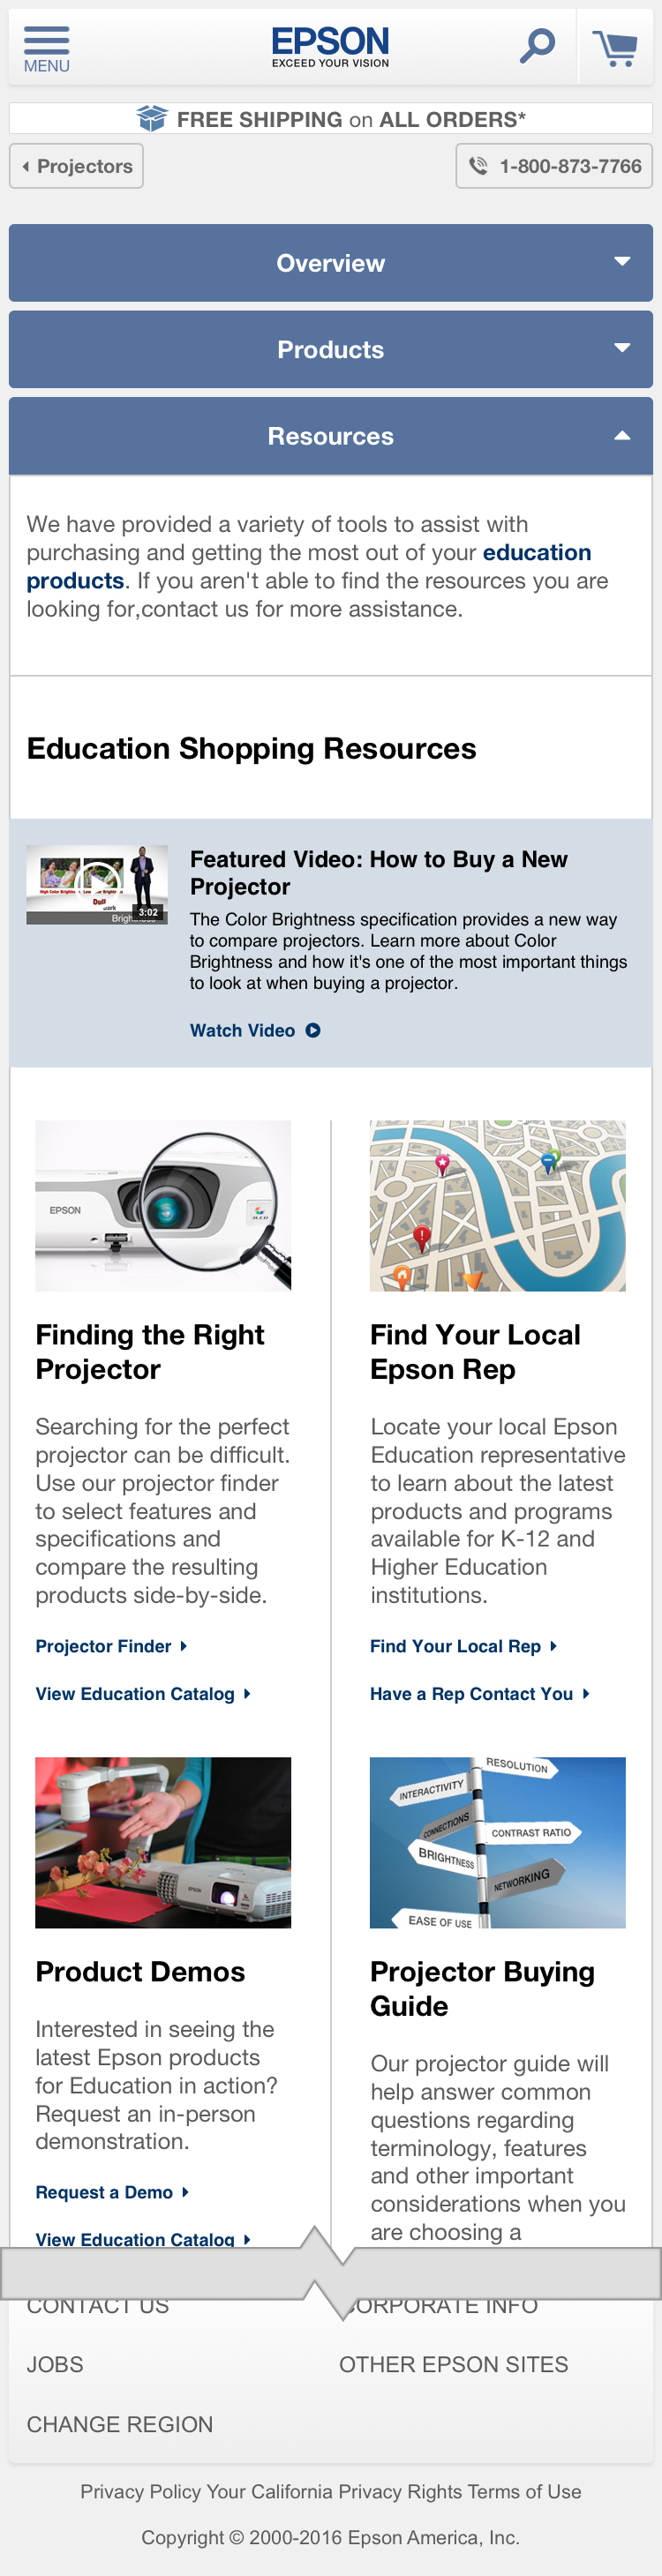 Education Projectors - Resources